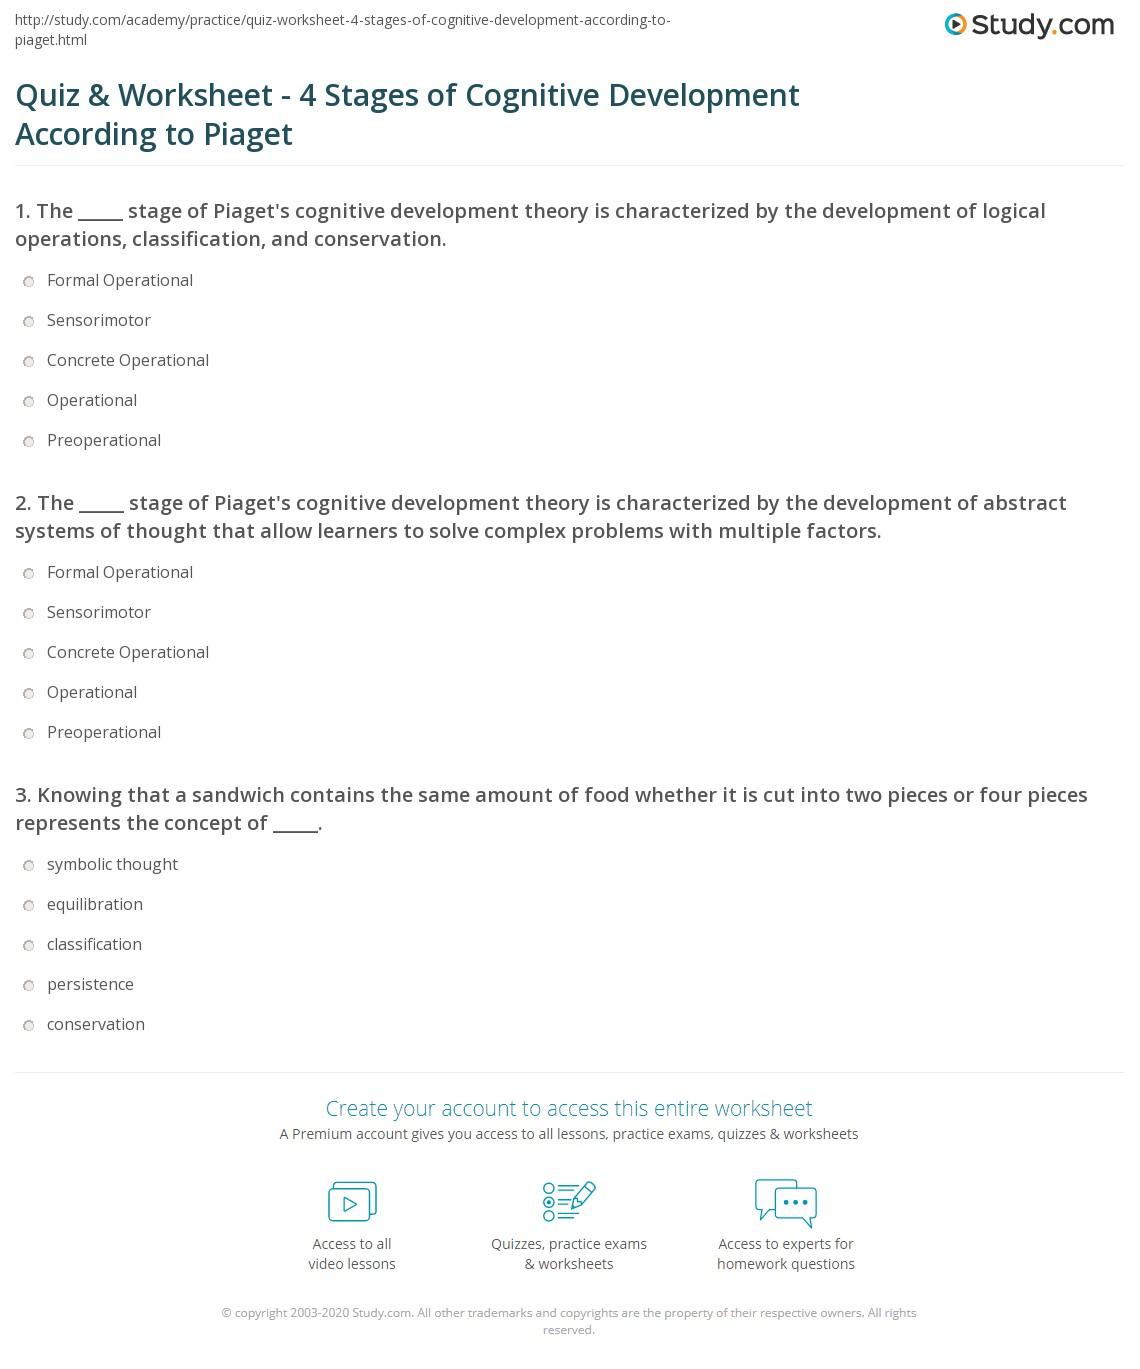 Piaget Worksheet Answers